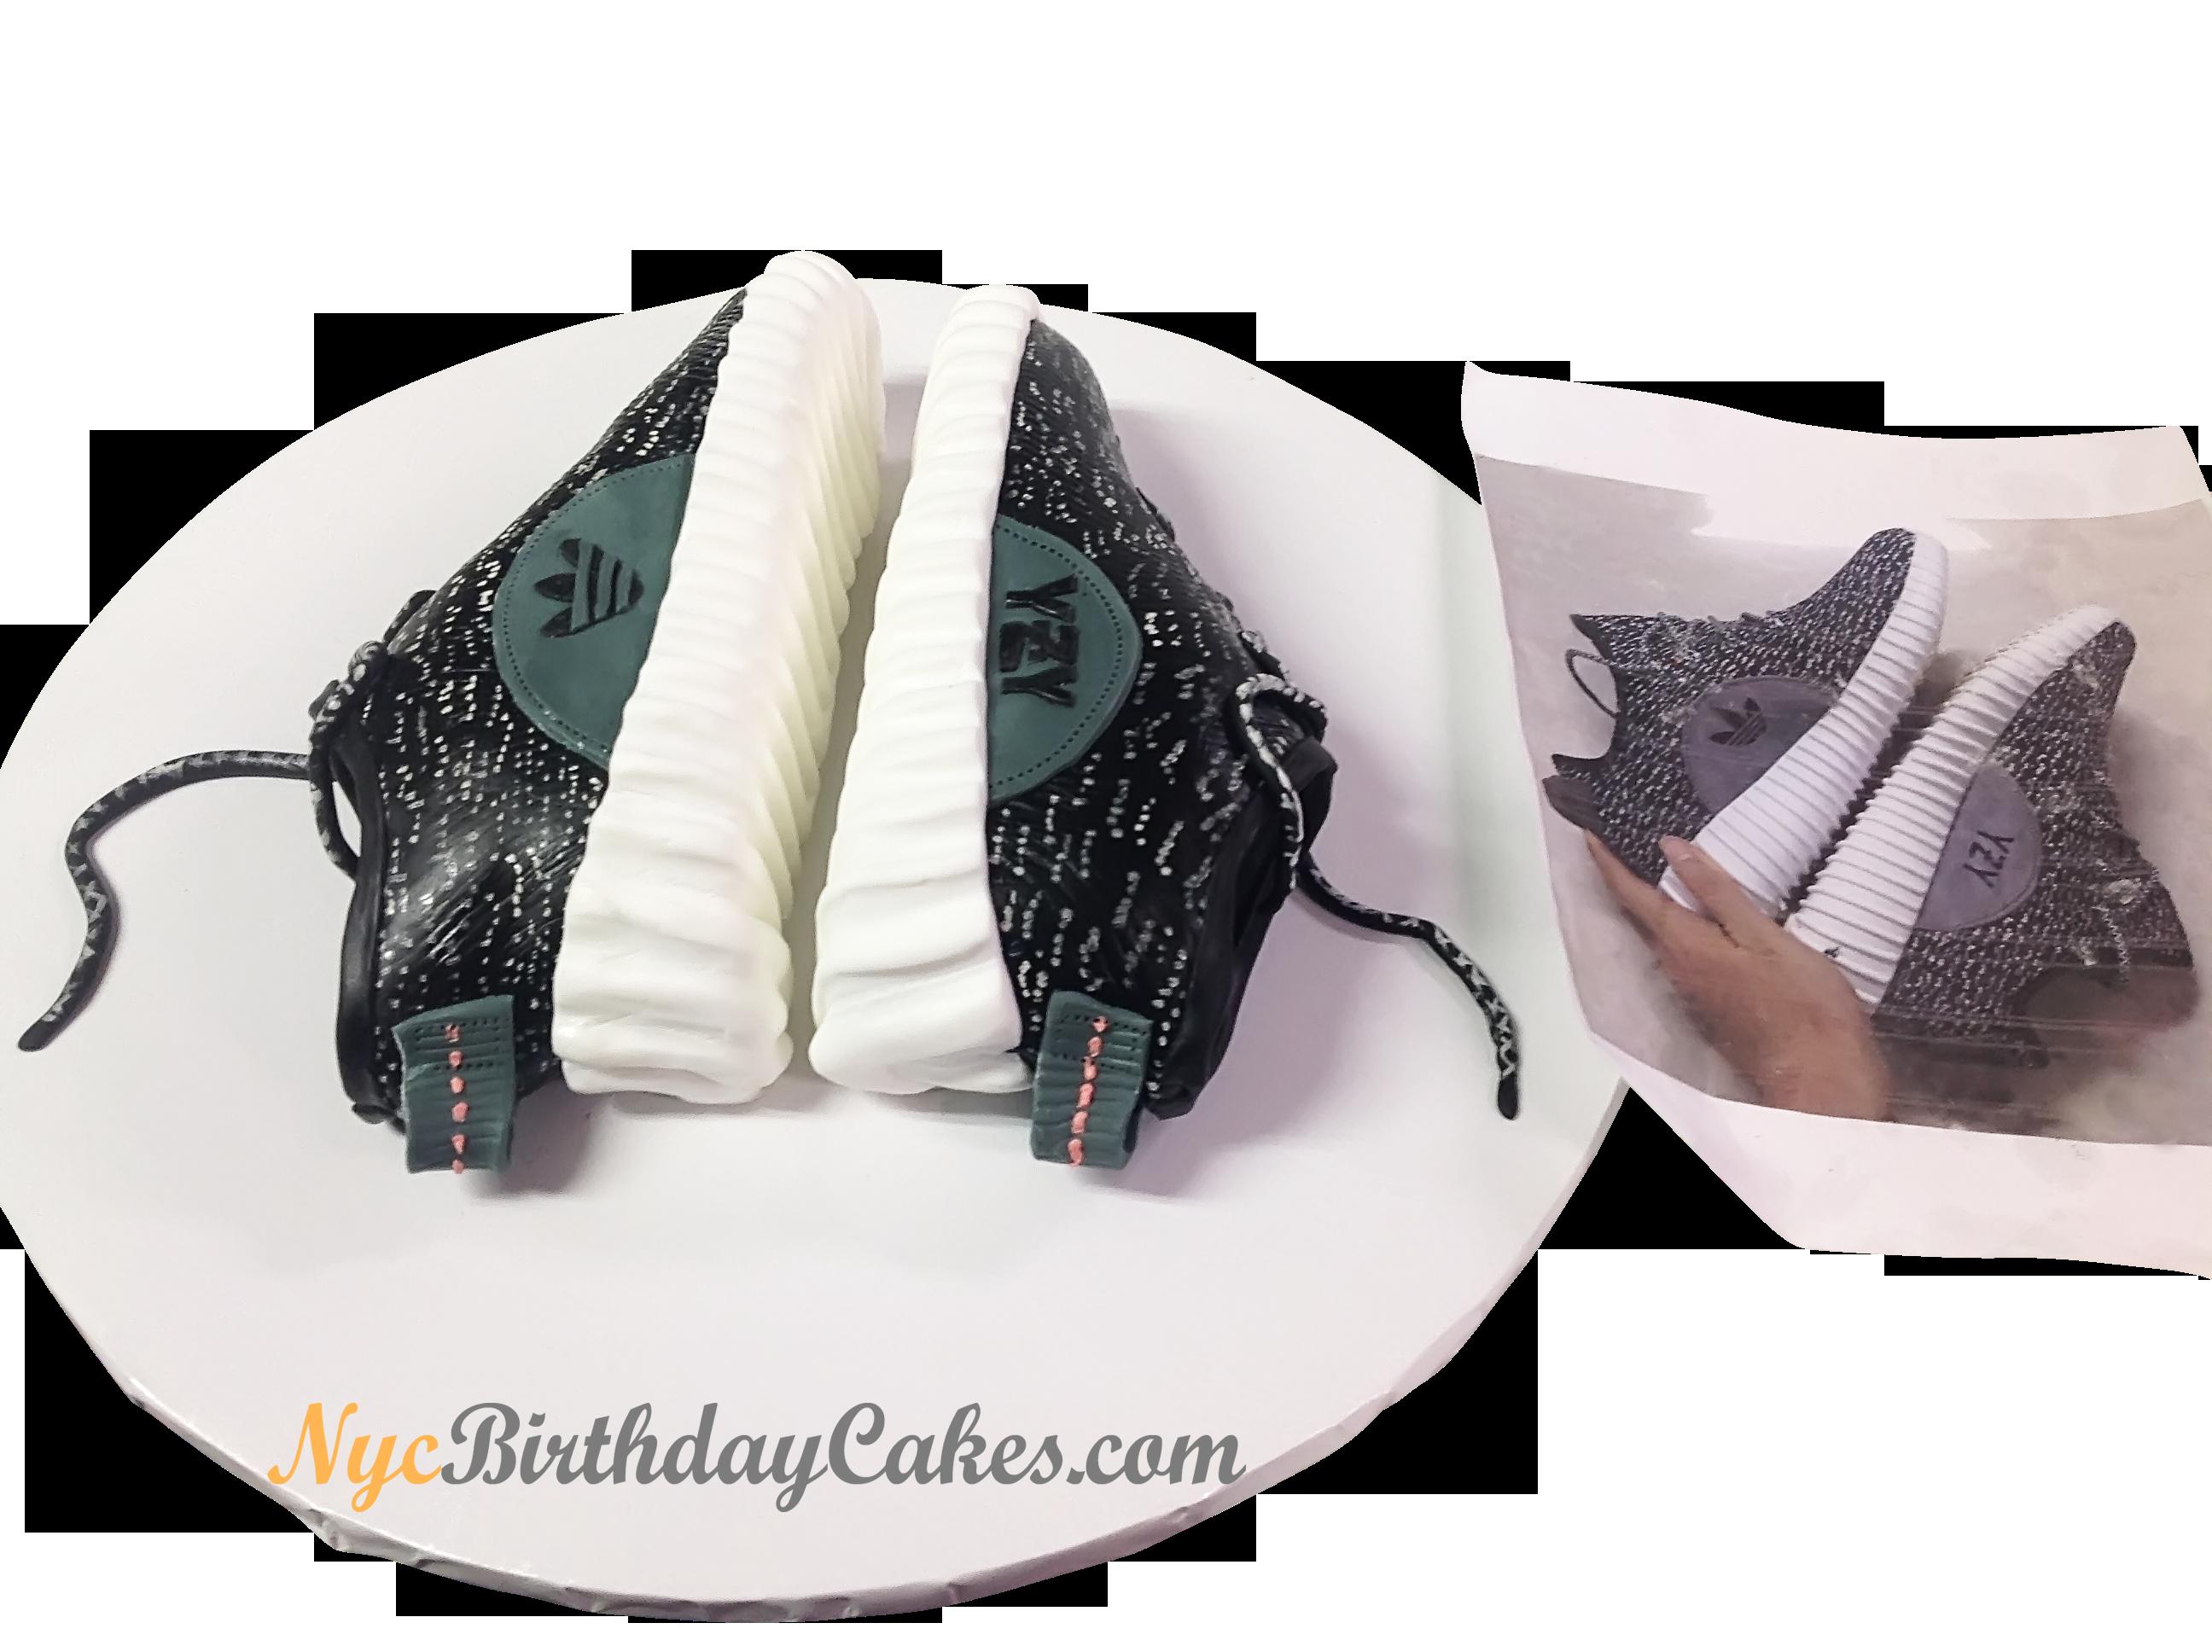 yeezy sneaker themed custom cake nyc nycbirthdaycakes birthday